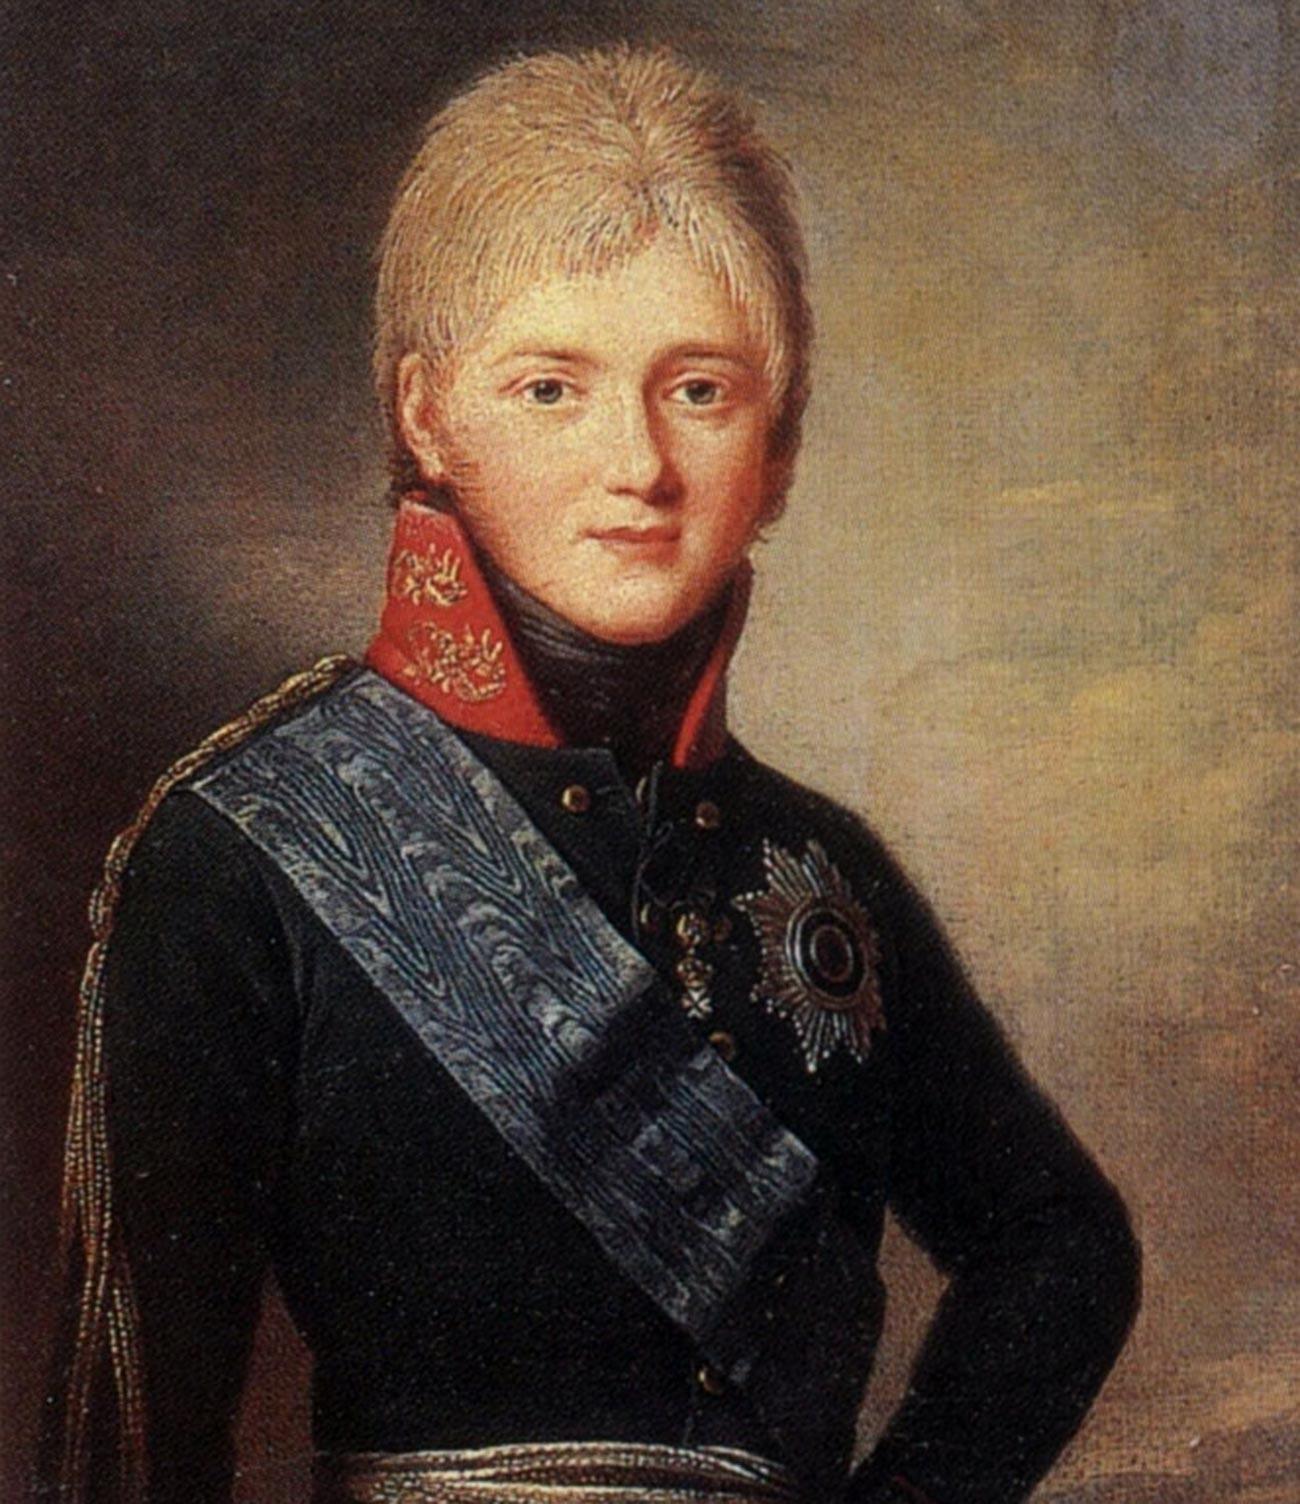 Großherzog Alexander, der zukünftige Kaiser Alexander I.